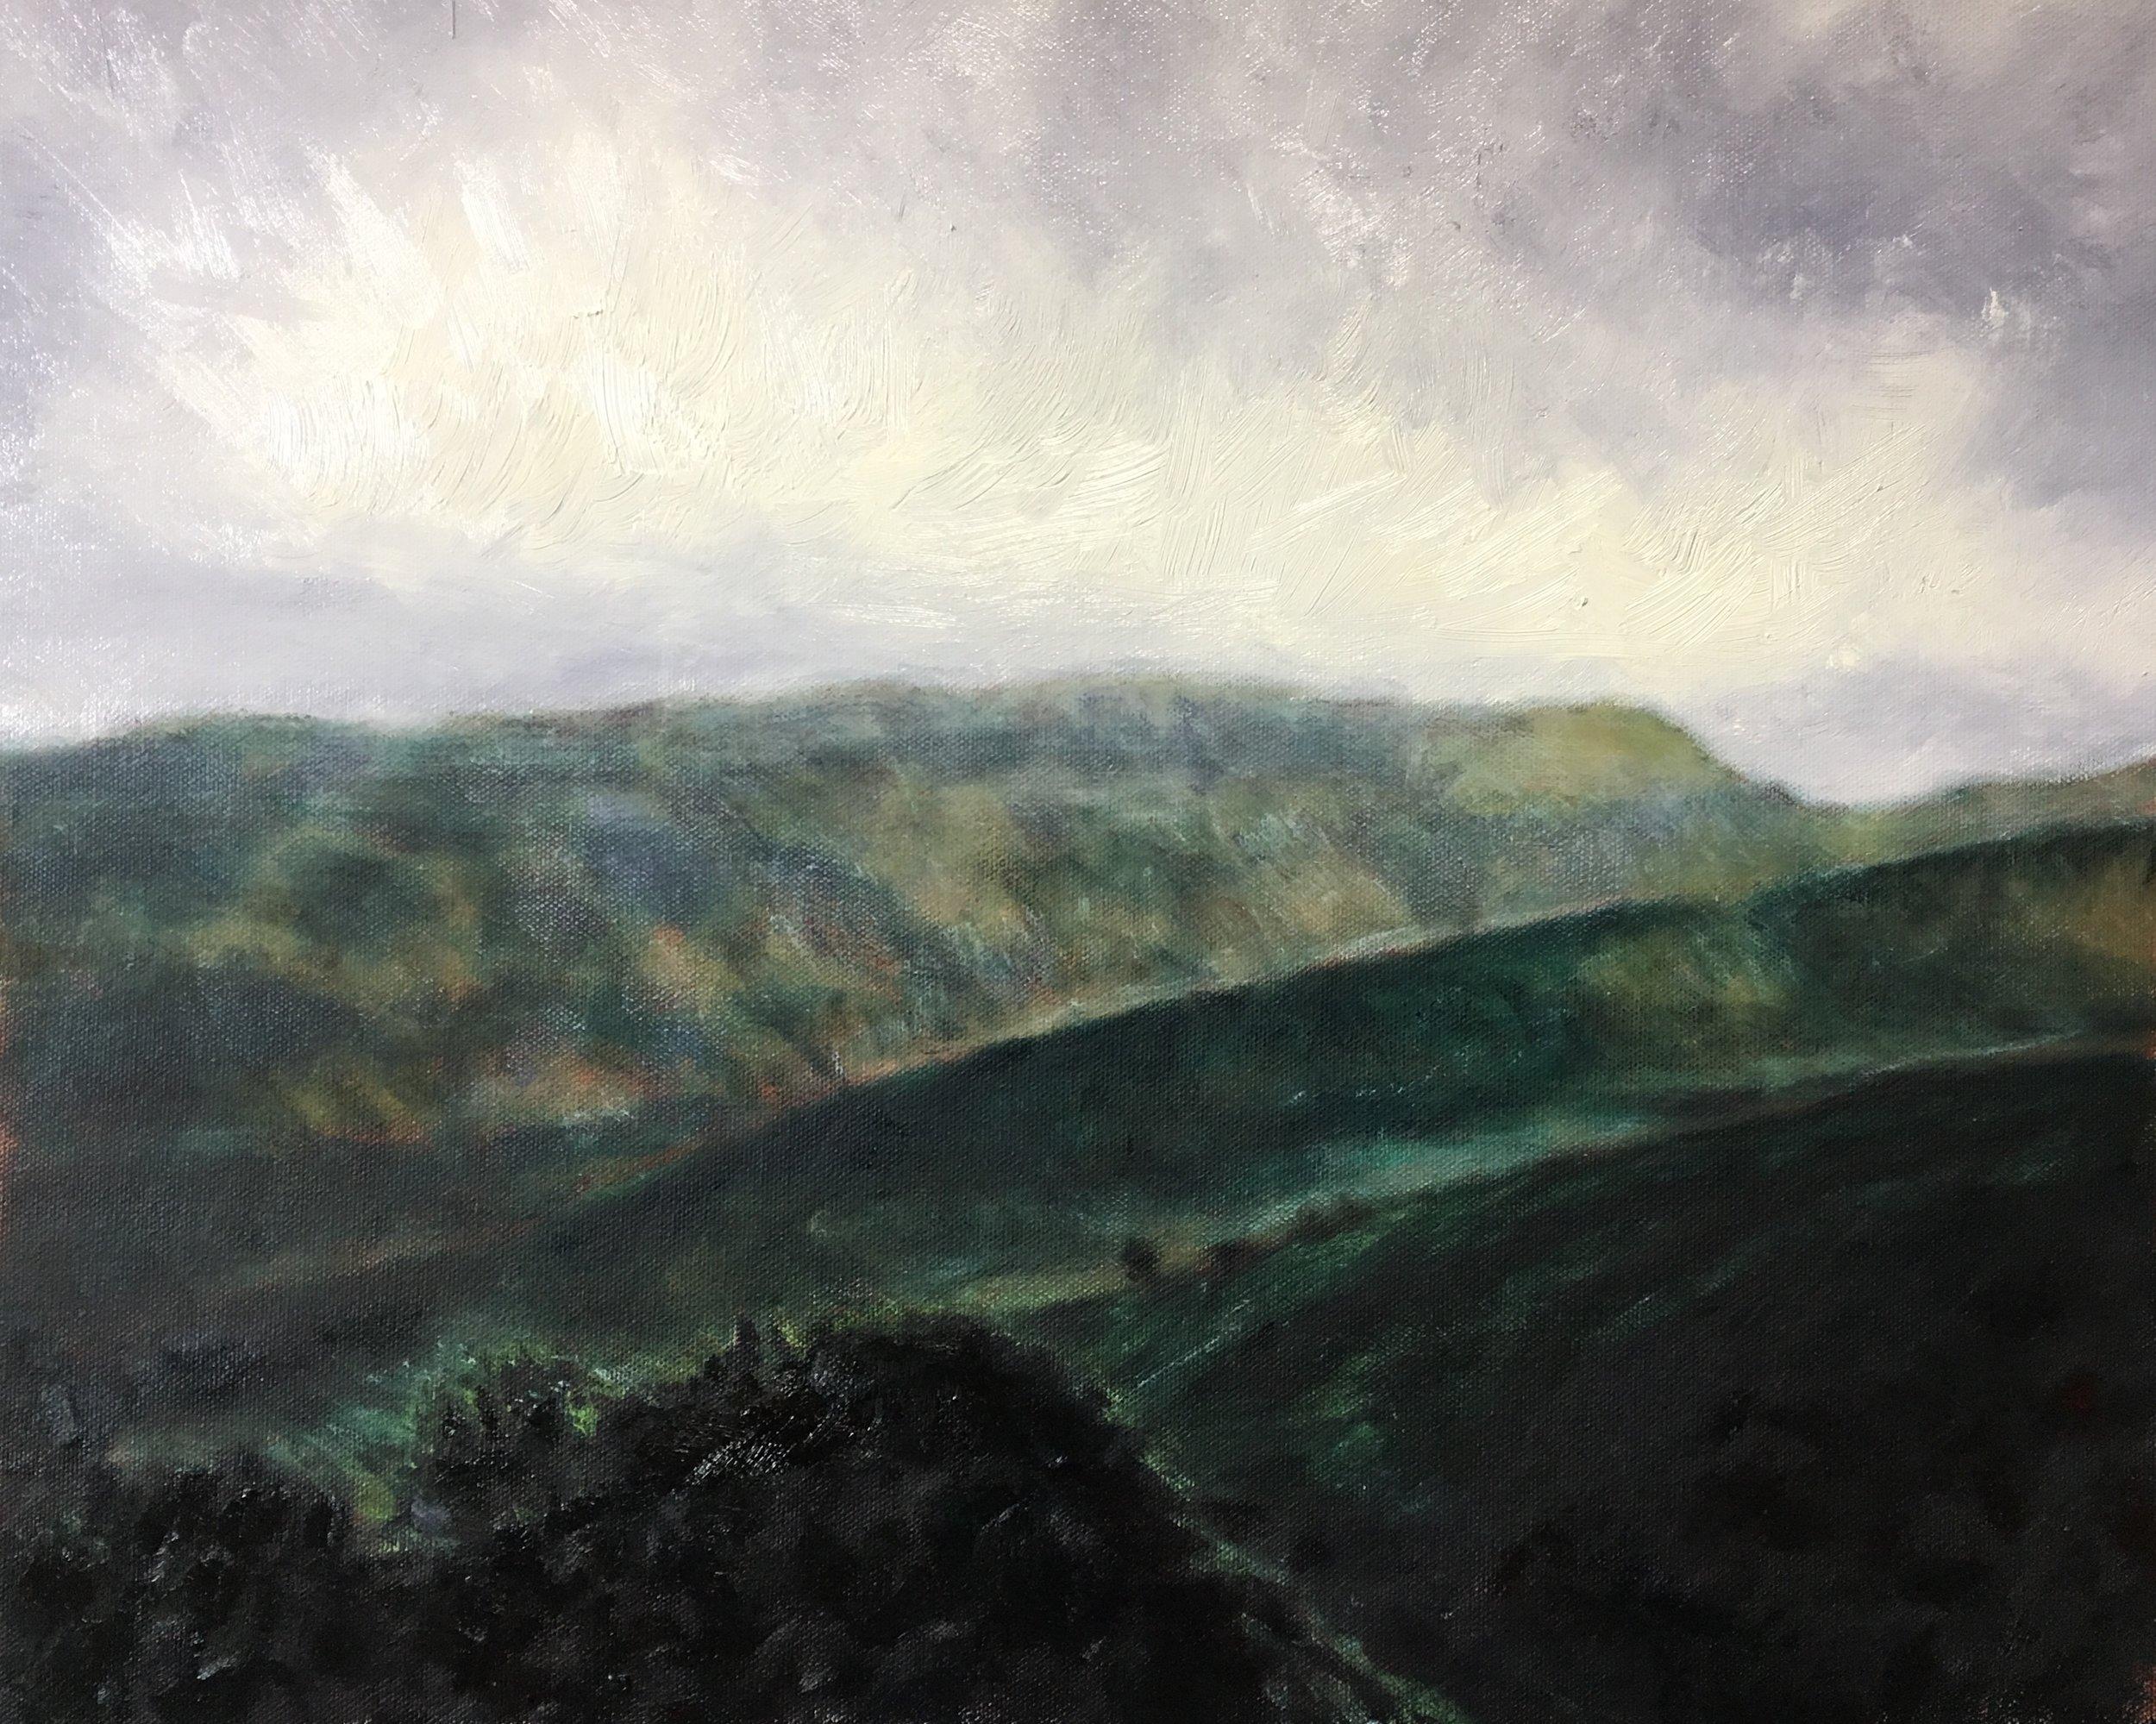 Morning View 3 from Calton Hill, Edinburgh